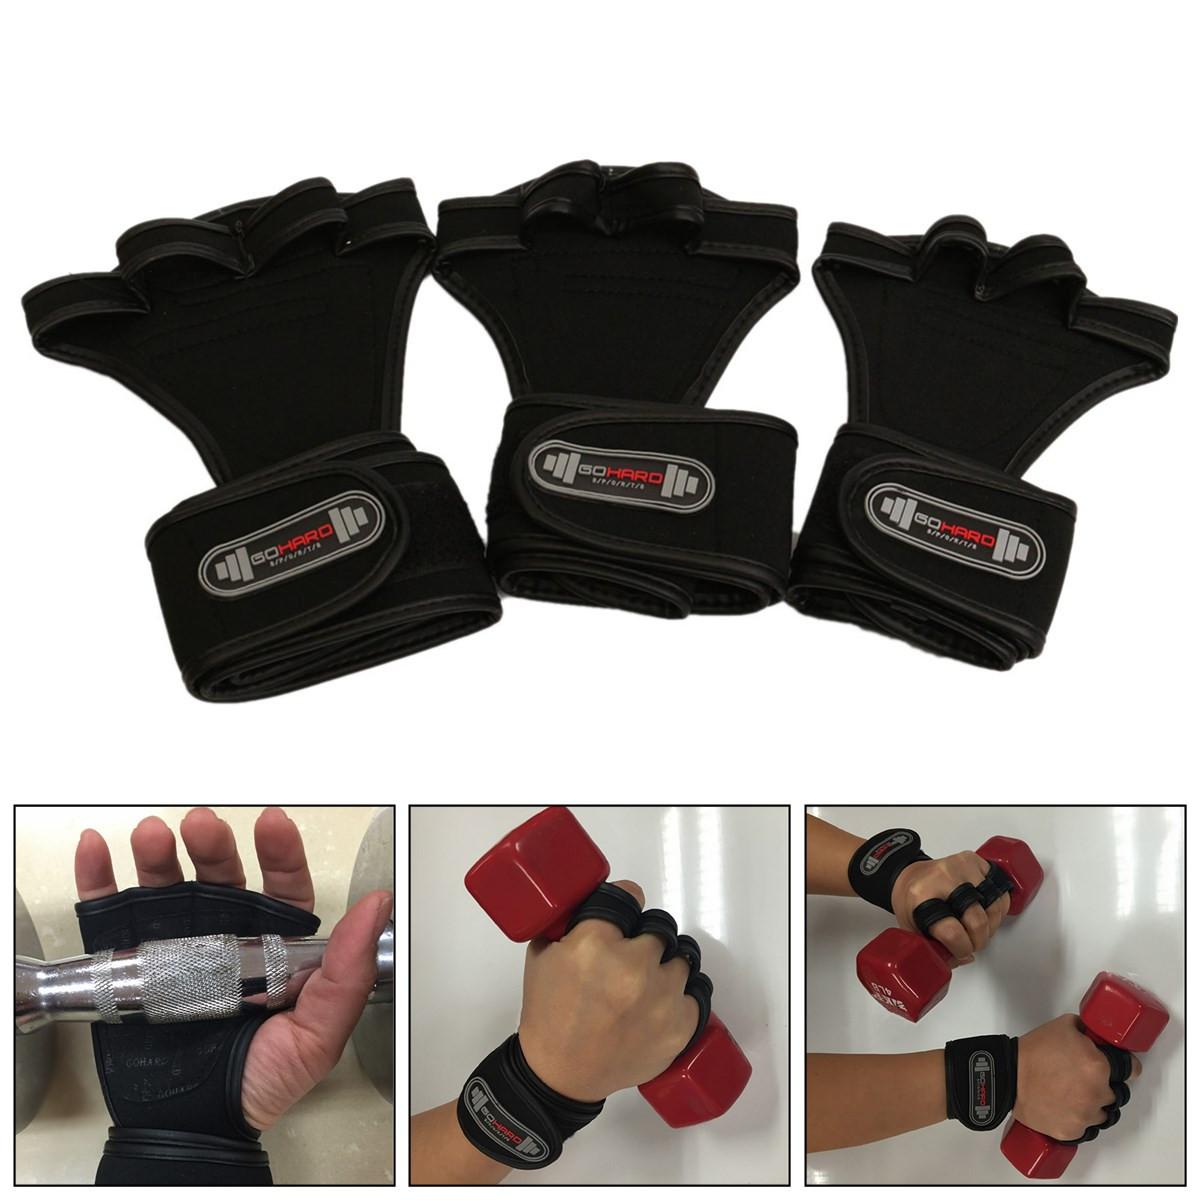 Sport Gloves For Gym: Sports Wrist Bracer Hand Palm Glove For Fitness Gym